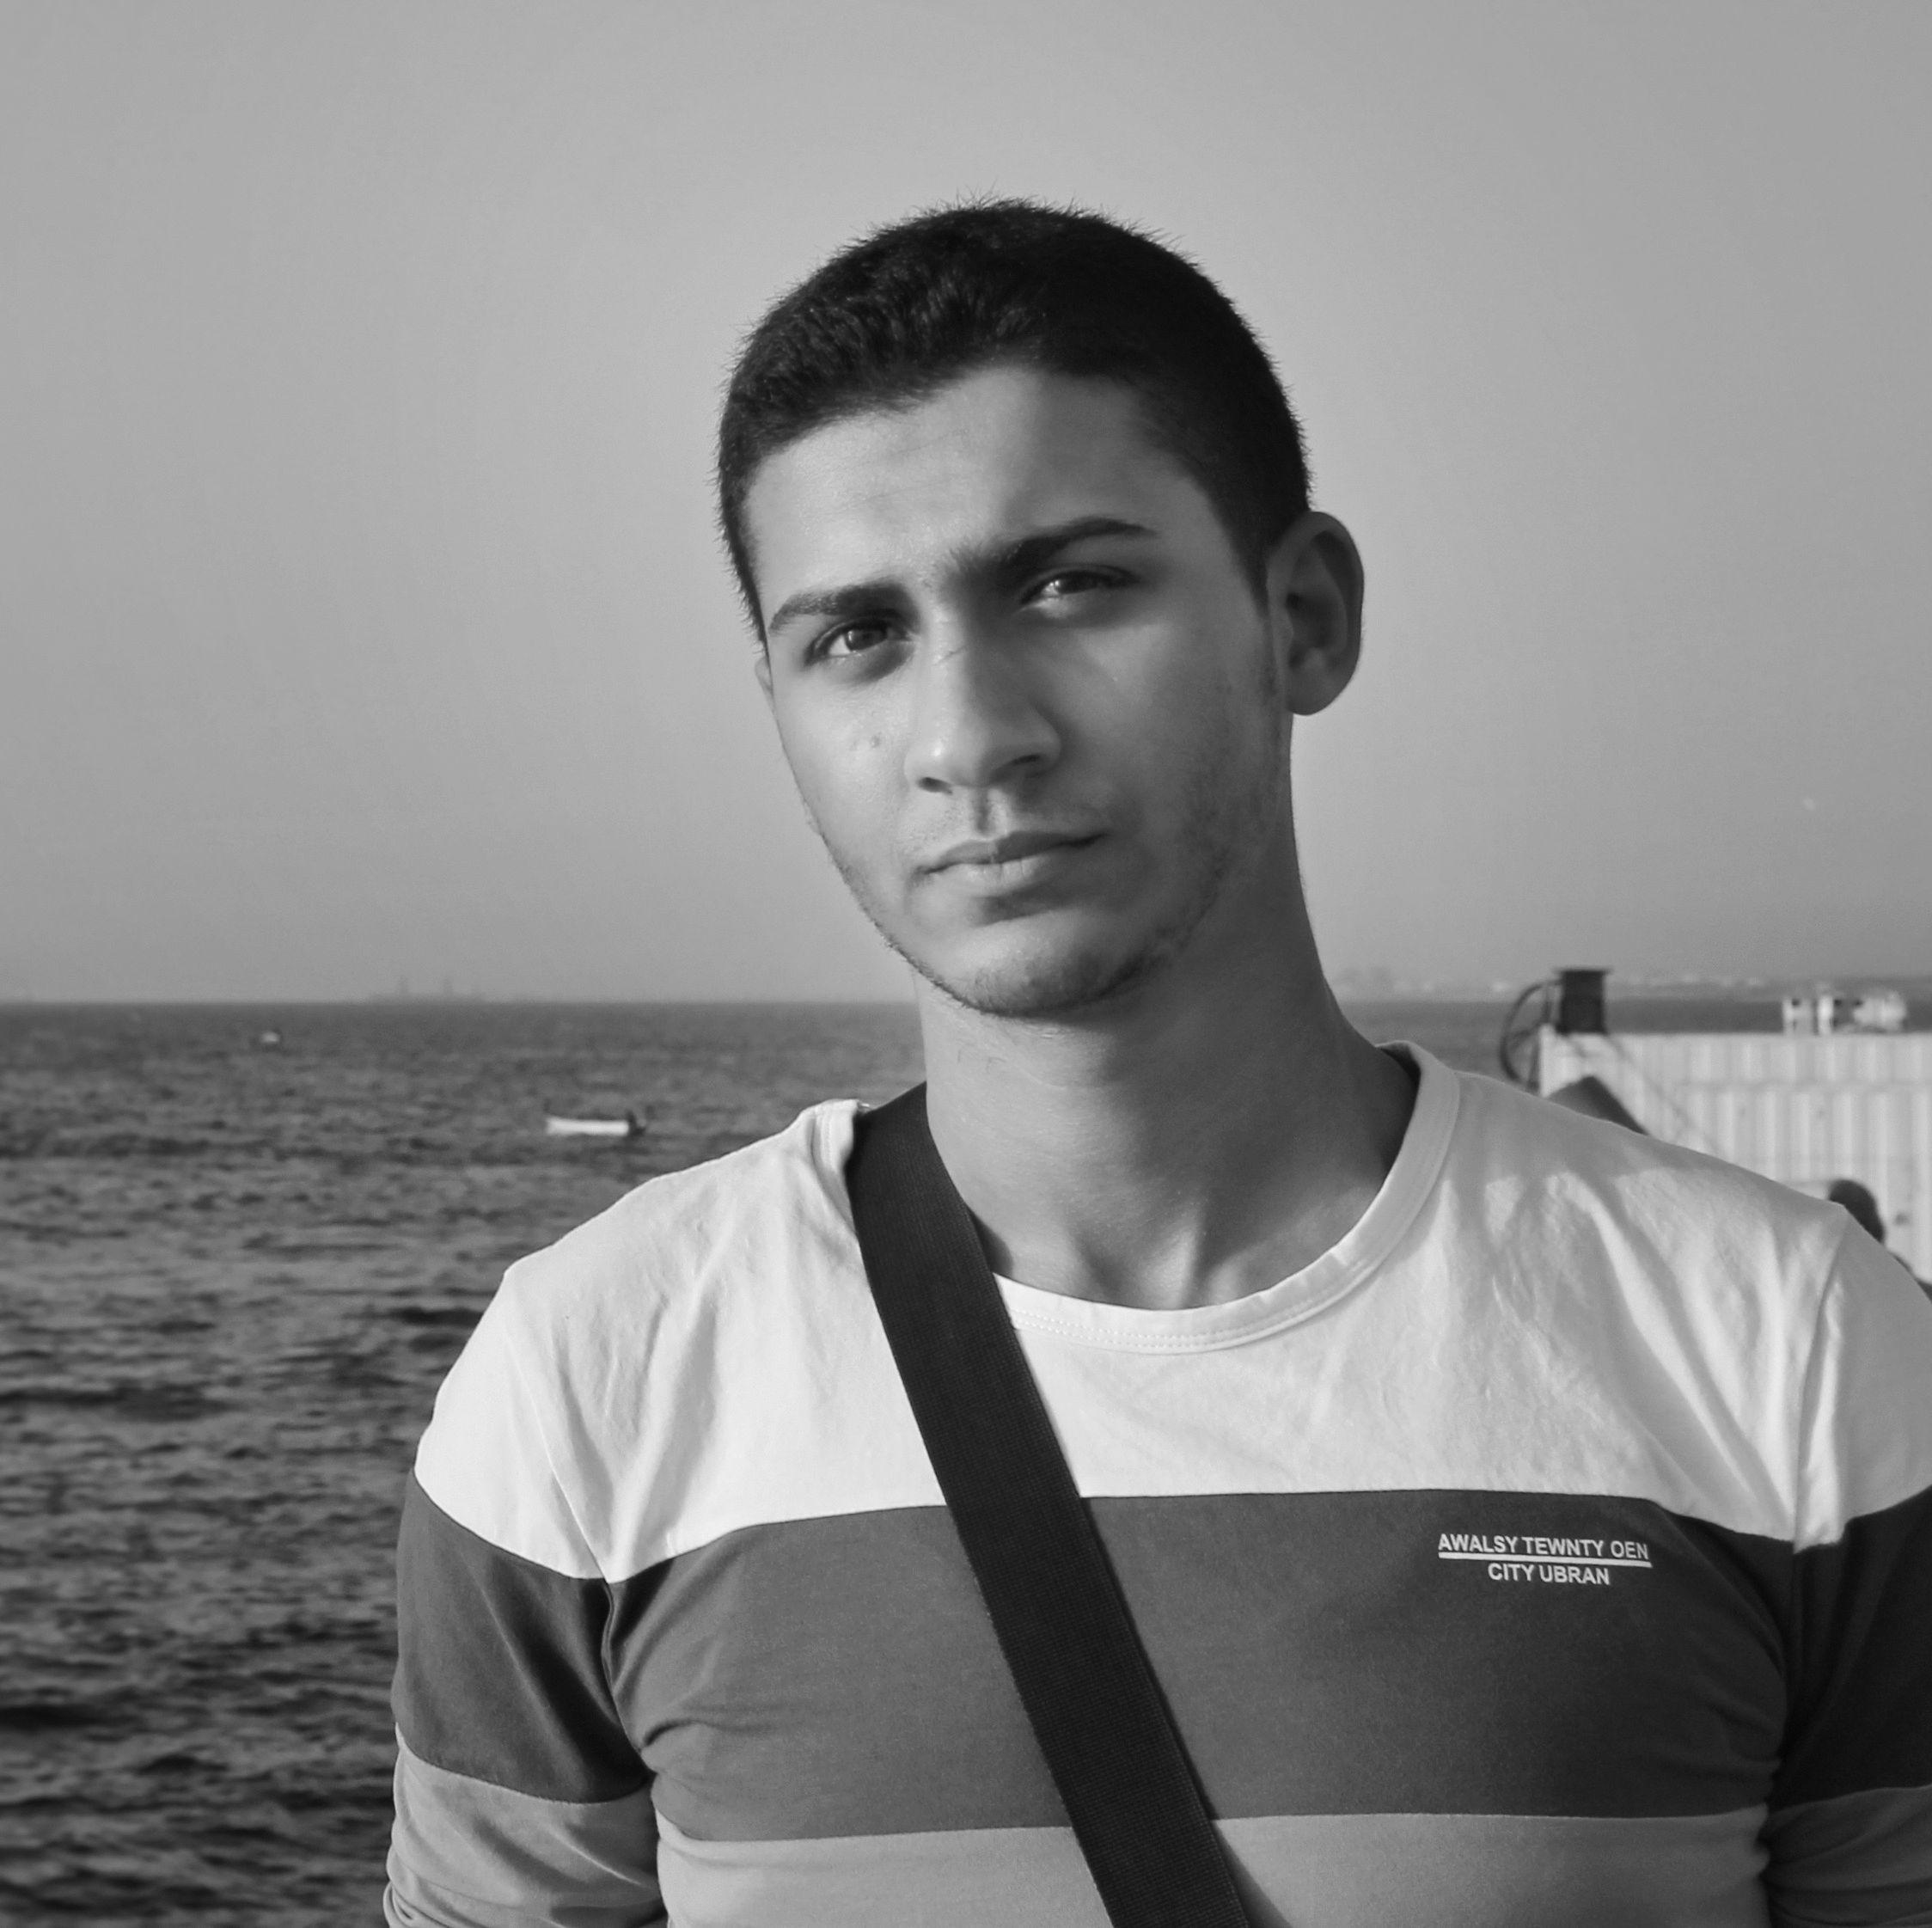 محمد هشام المصري Headshot